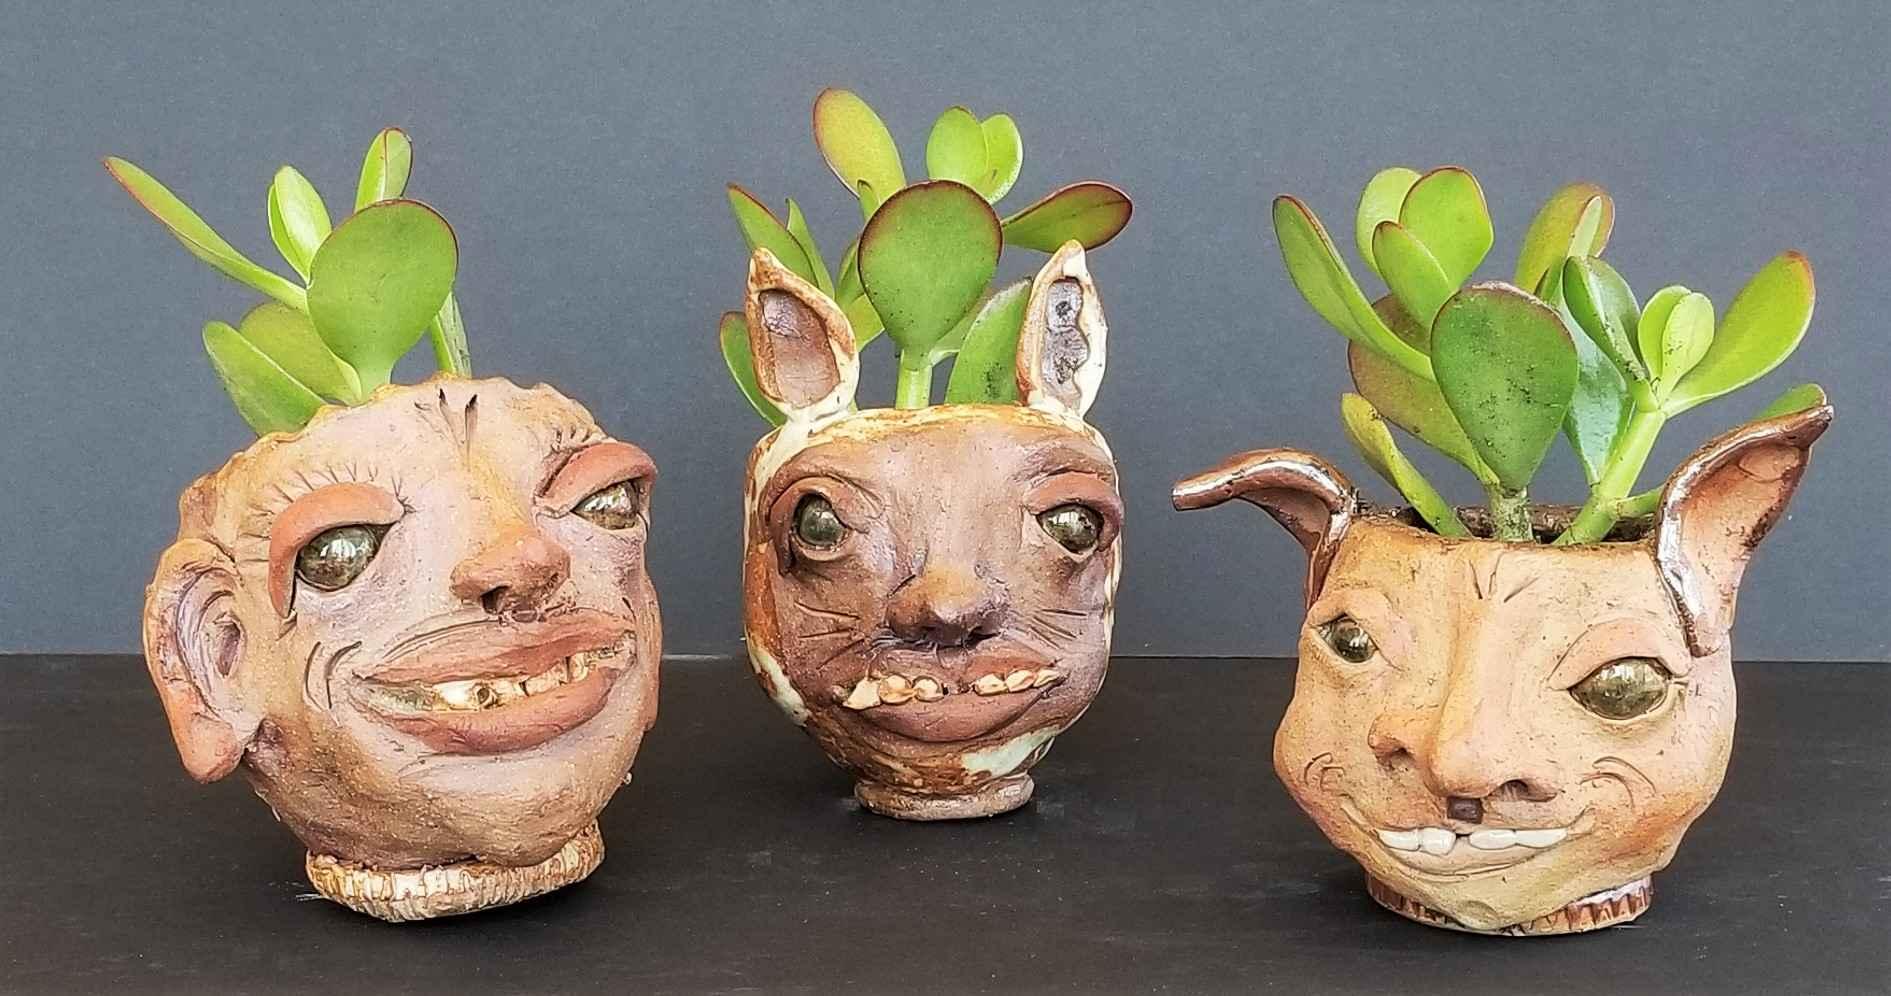 Medium Pot Head by  Linda Kowalewski - Masterpiece Online